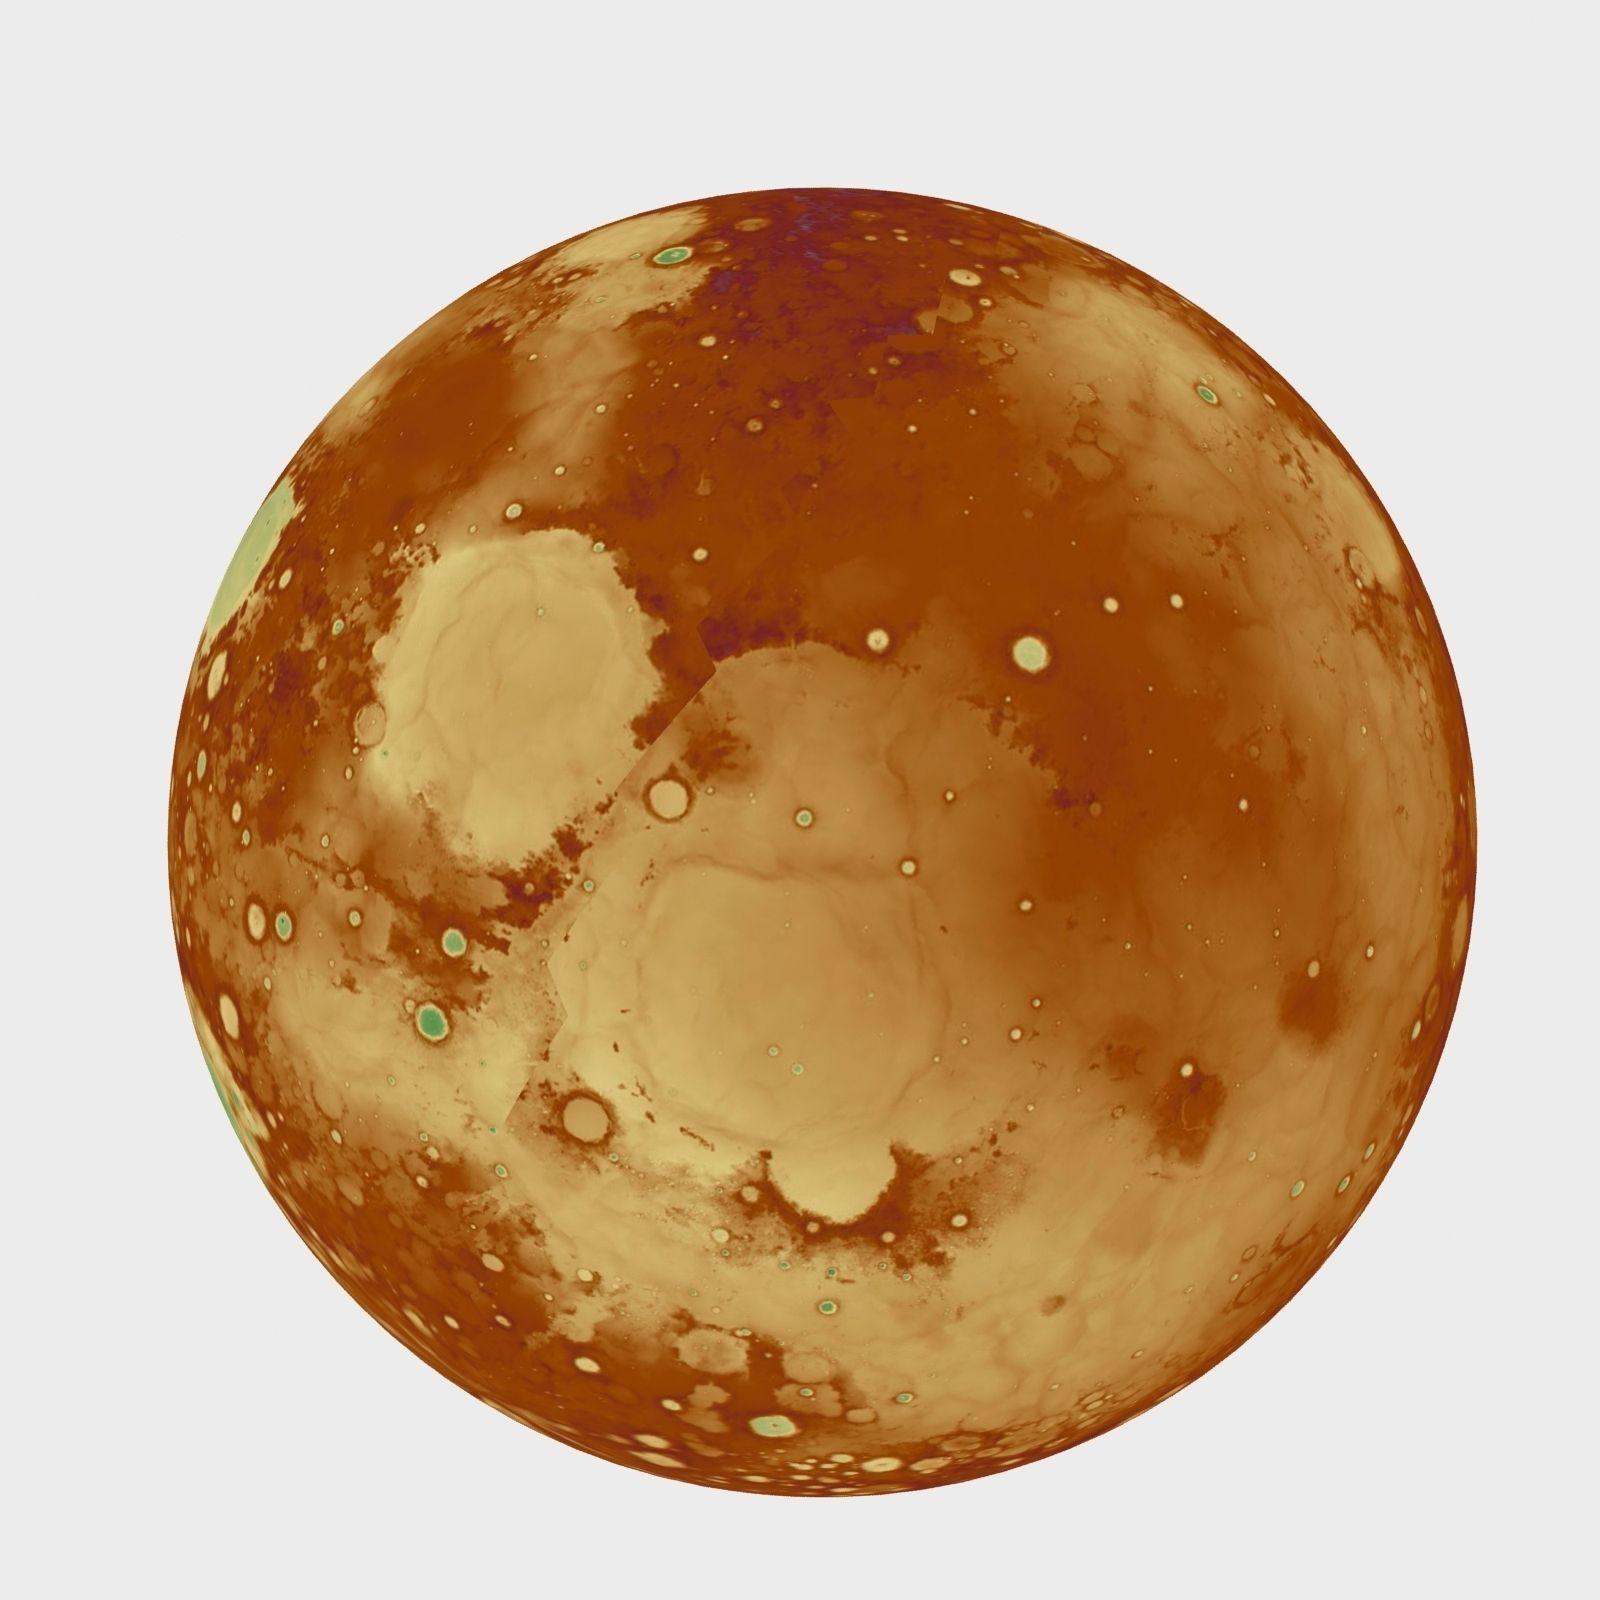 model of planet mars - photo #6